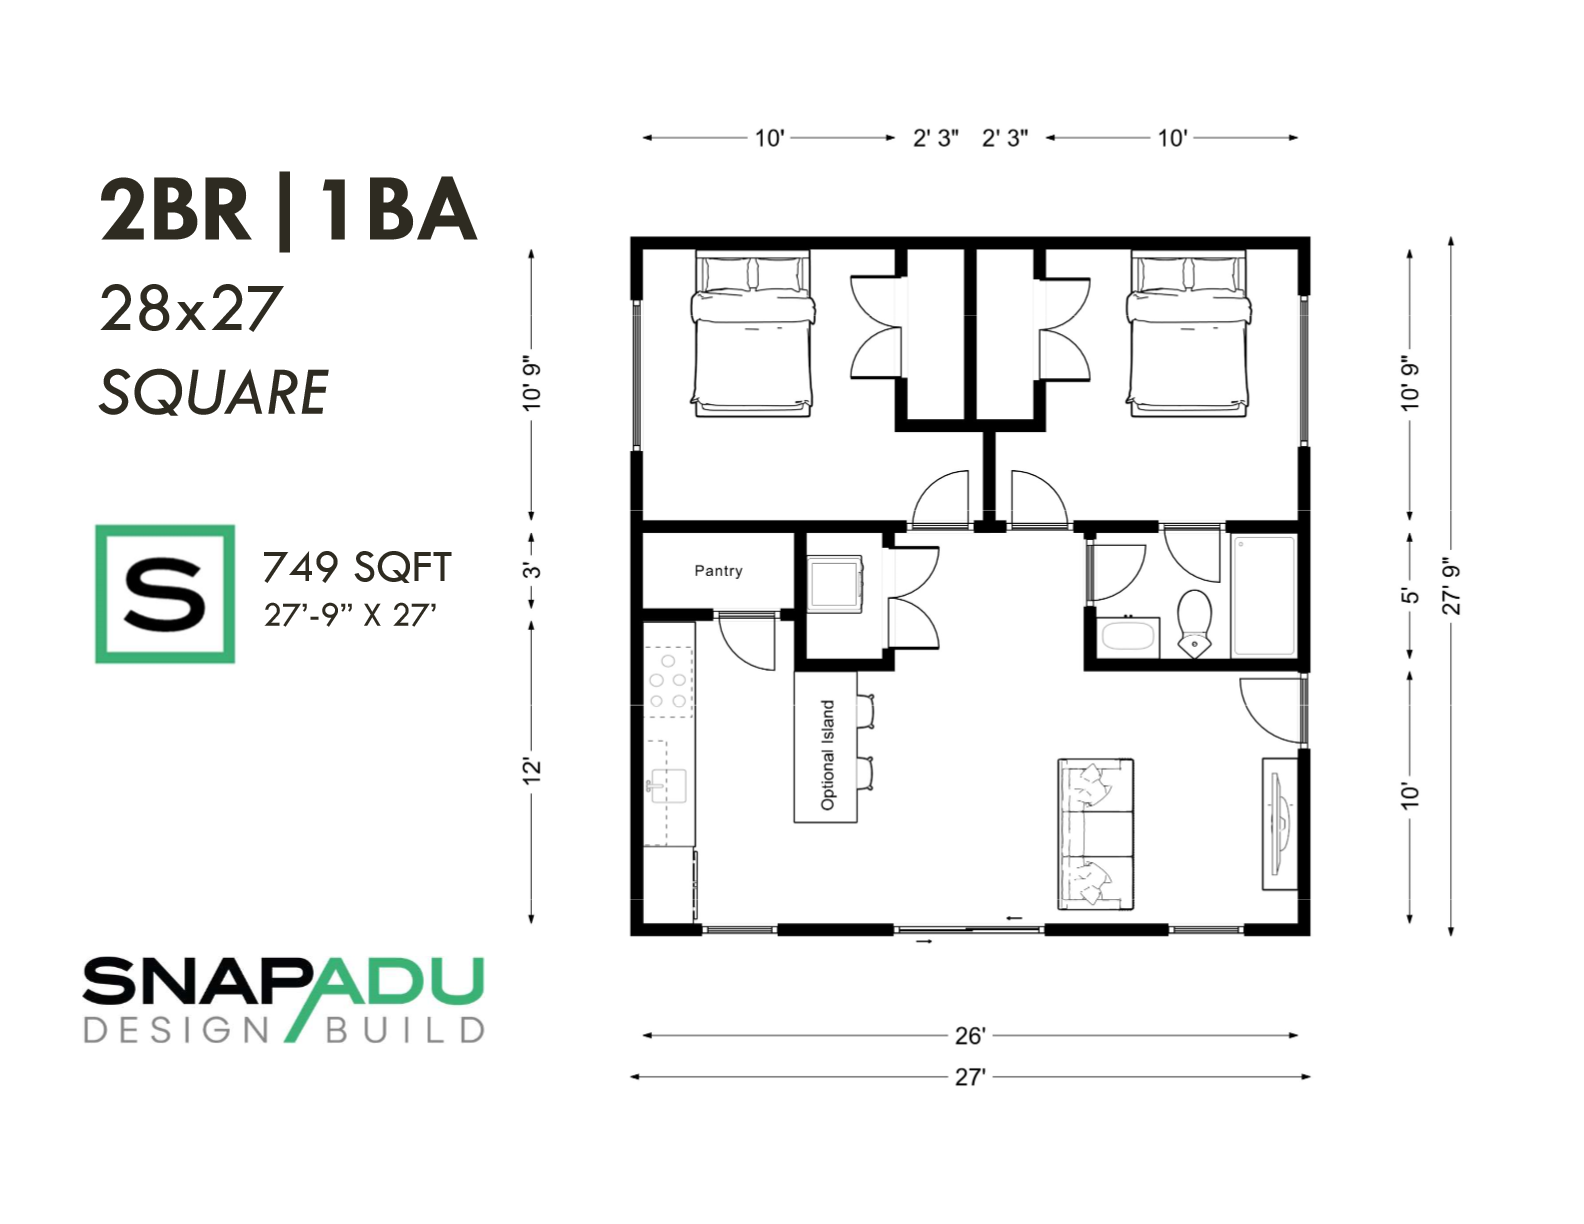 2BR 1BA 749 Sqft 28x27 SQUARE ADU floor plan